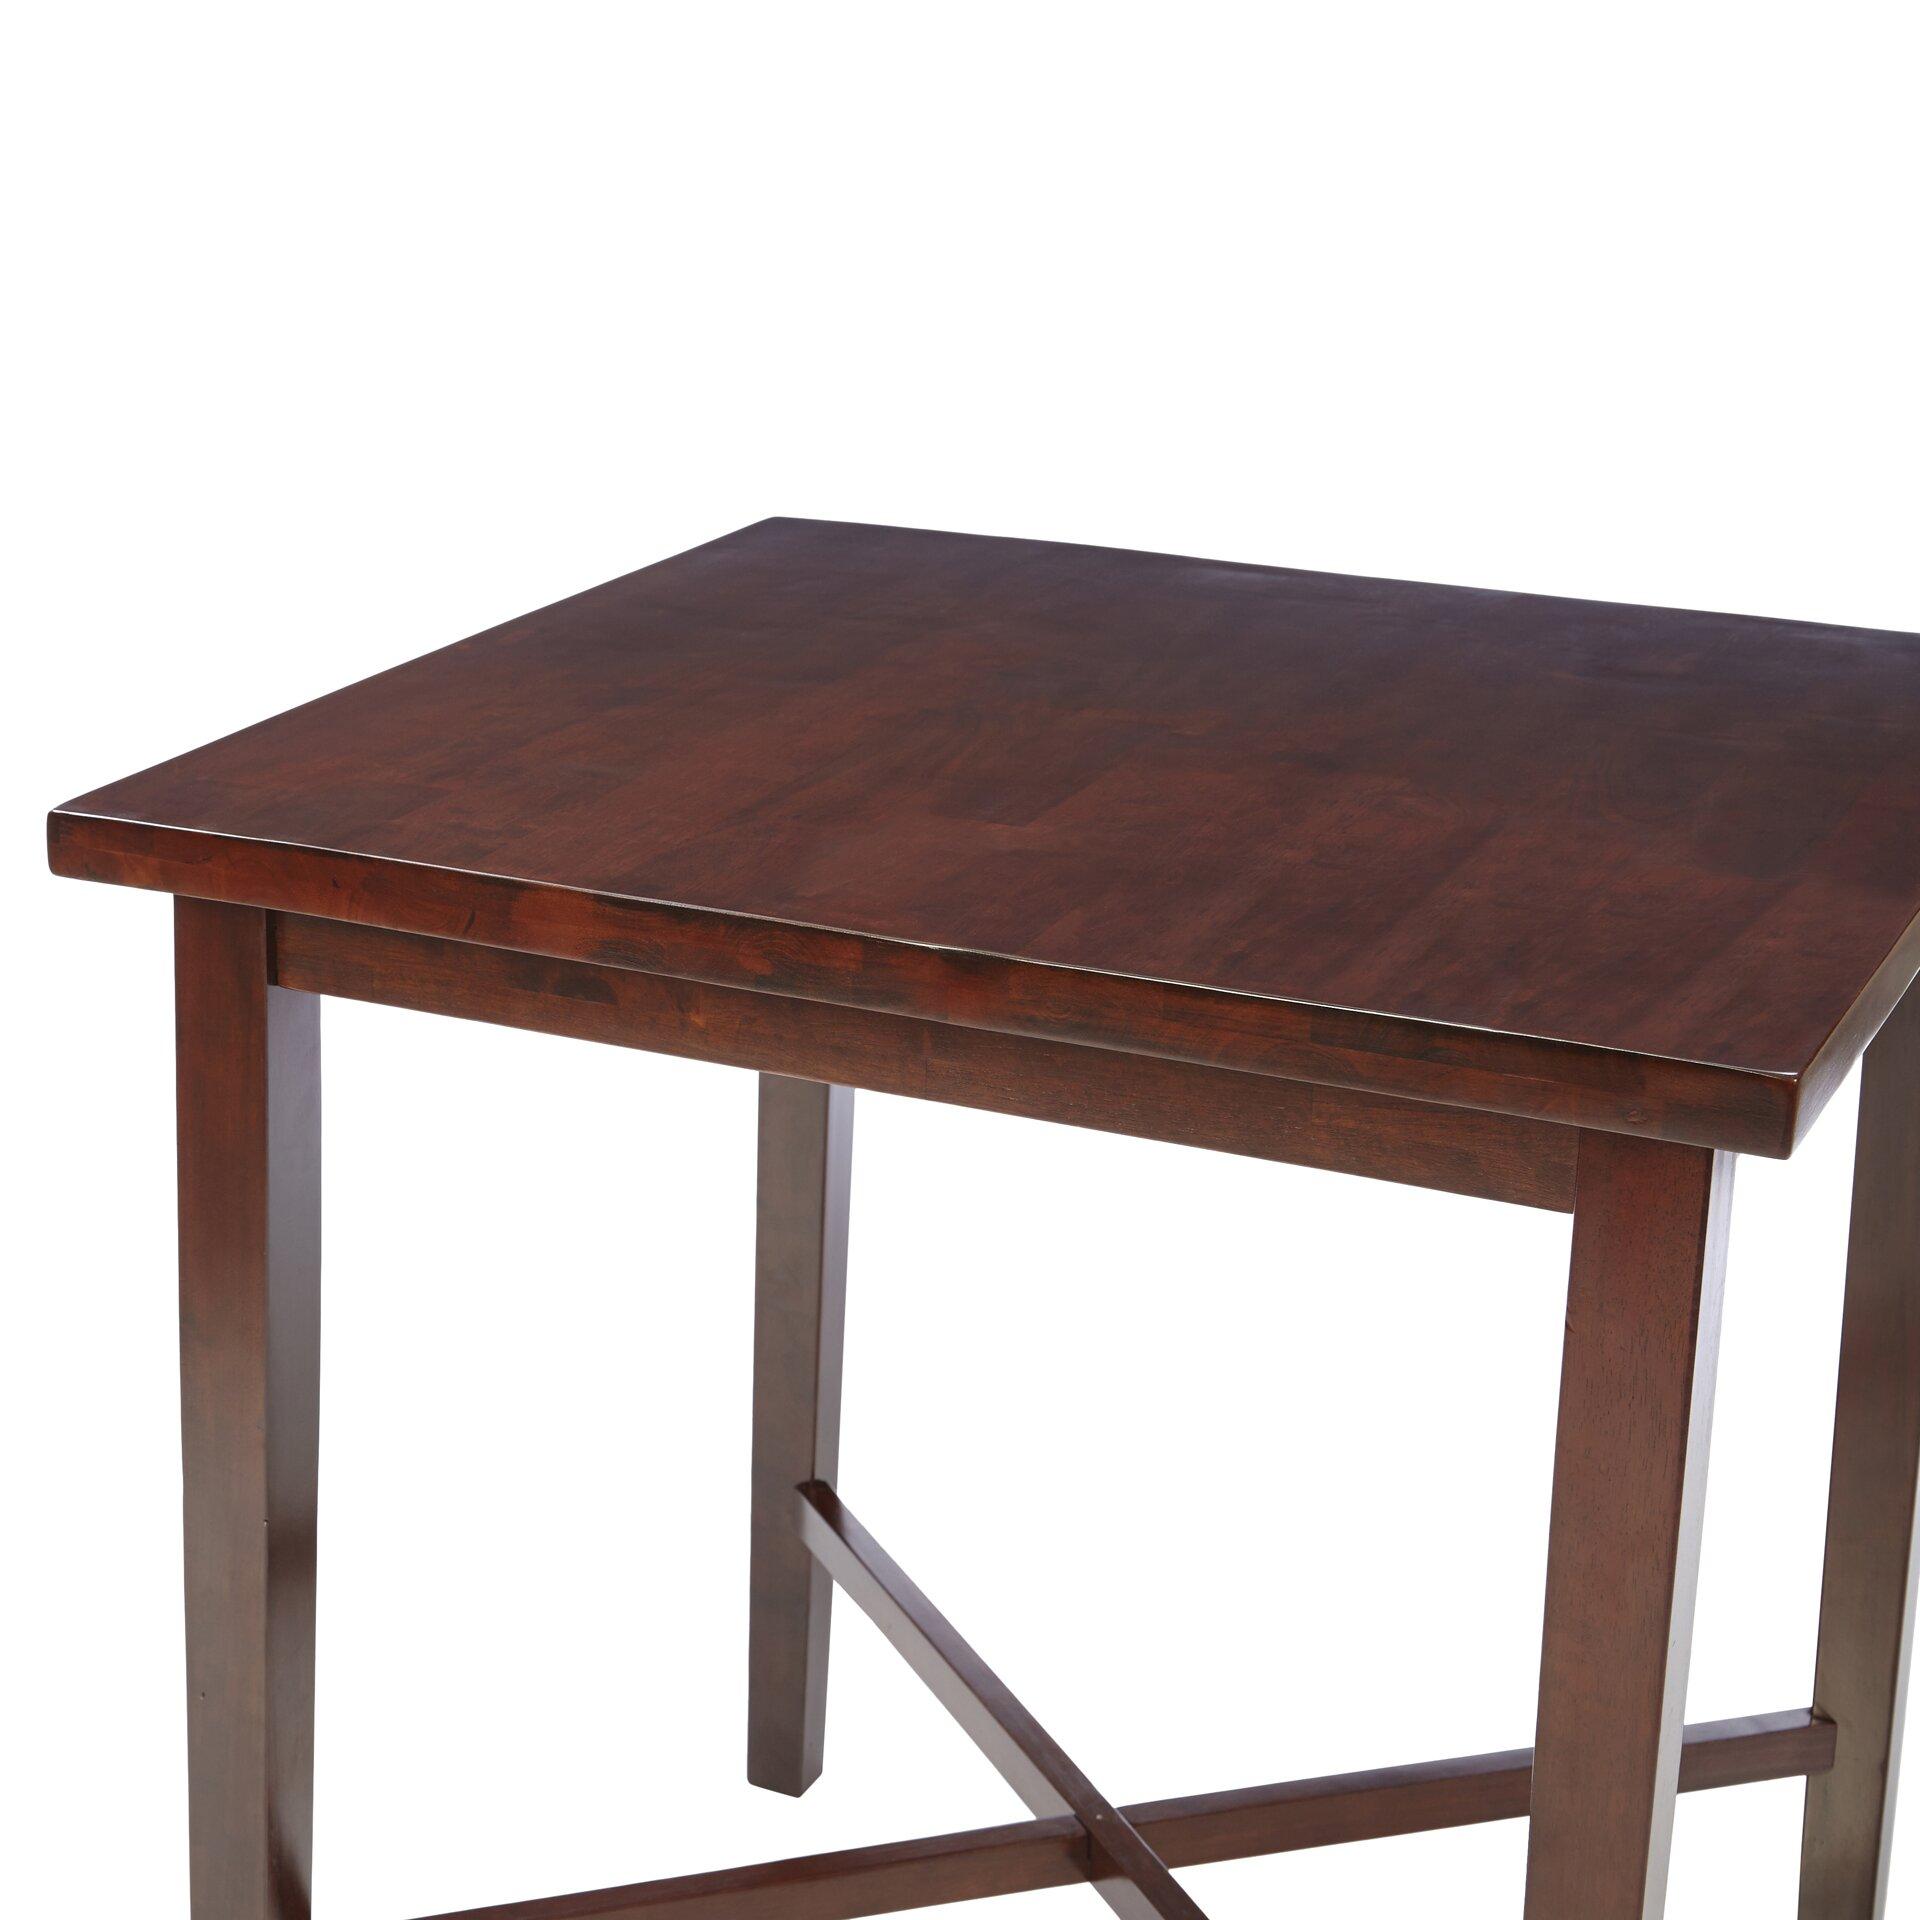 Red Barrel Studio Timberlake Square Wood Pub Table